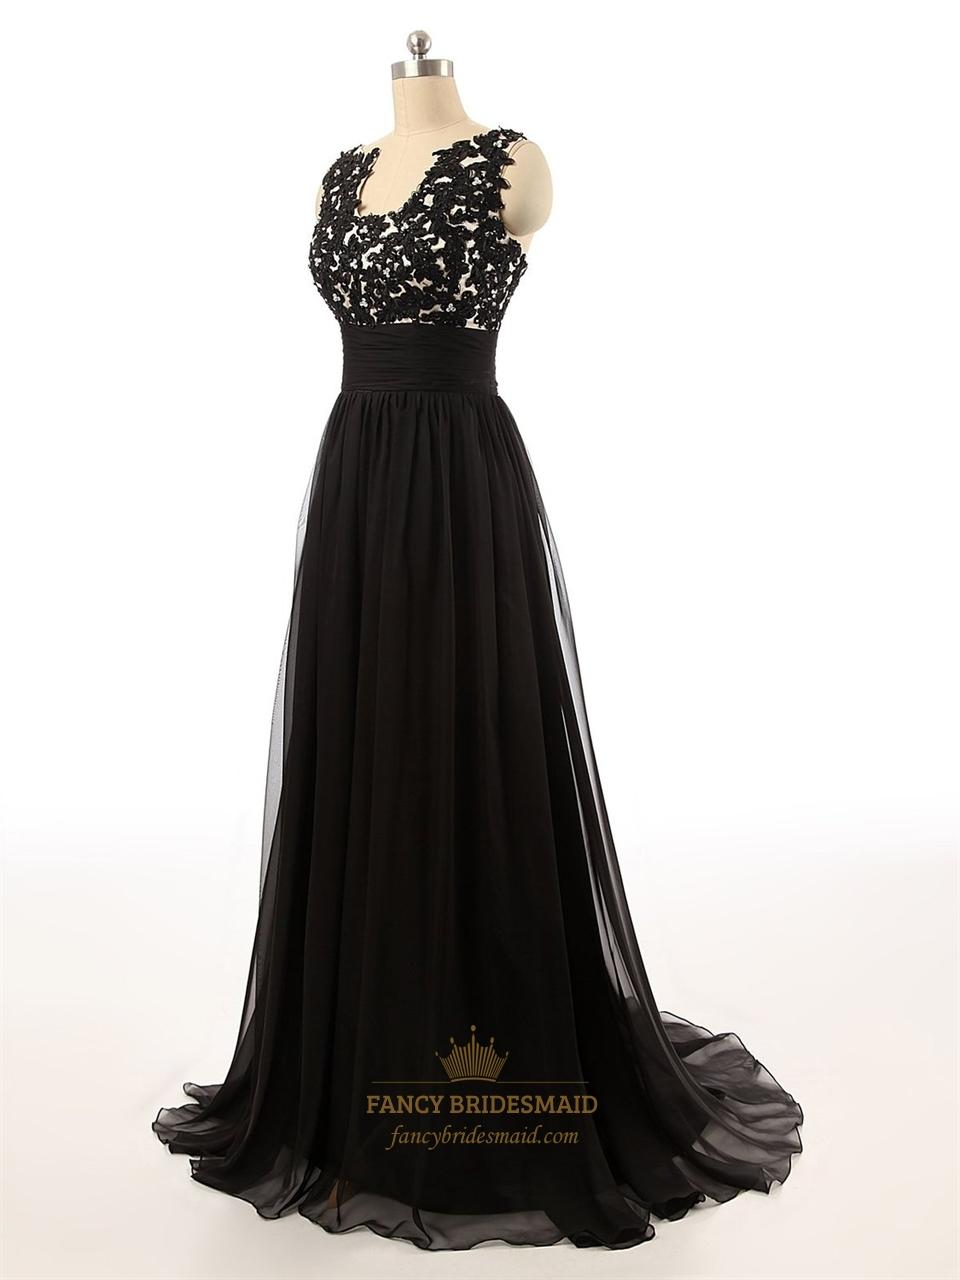 Black Full Length Empire Waist Lace Applique Bodice